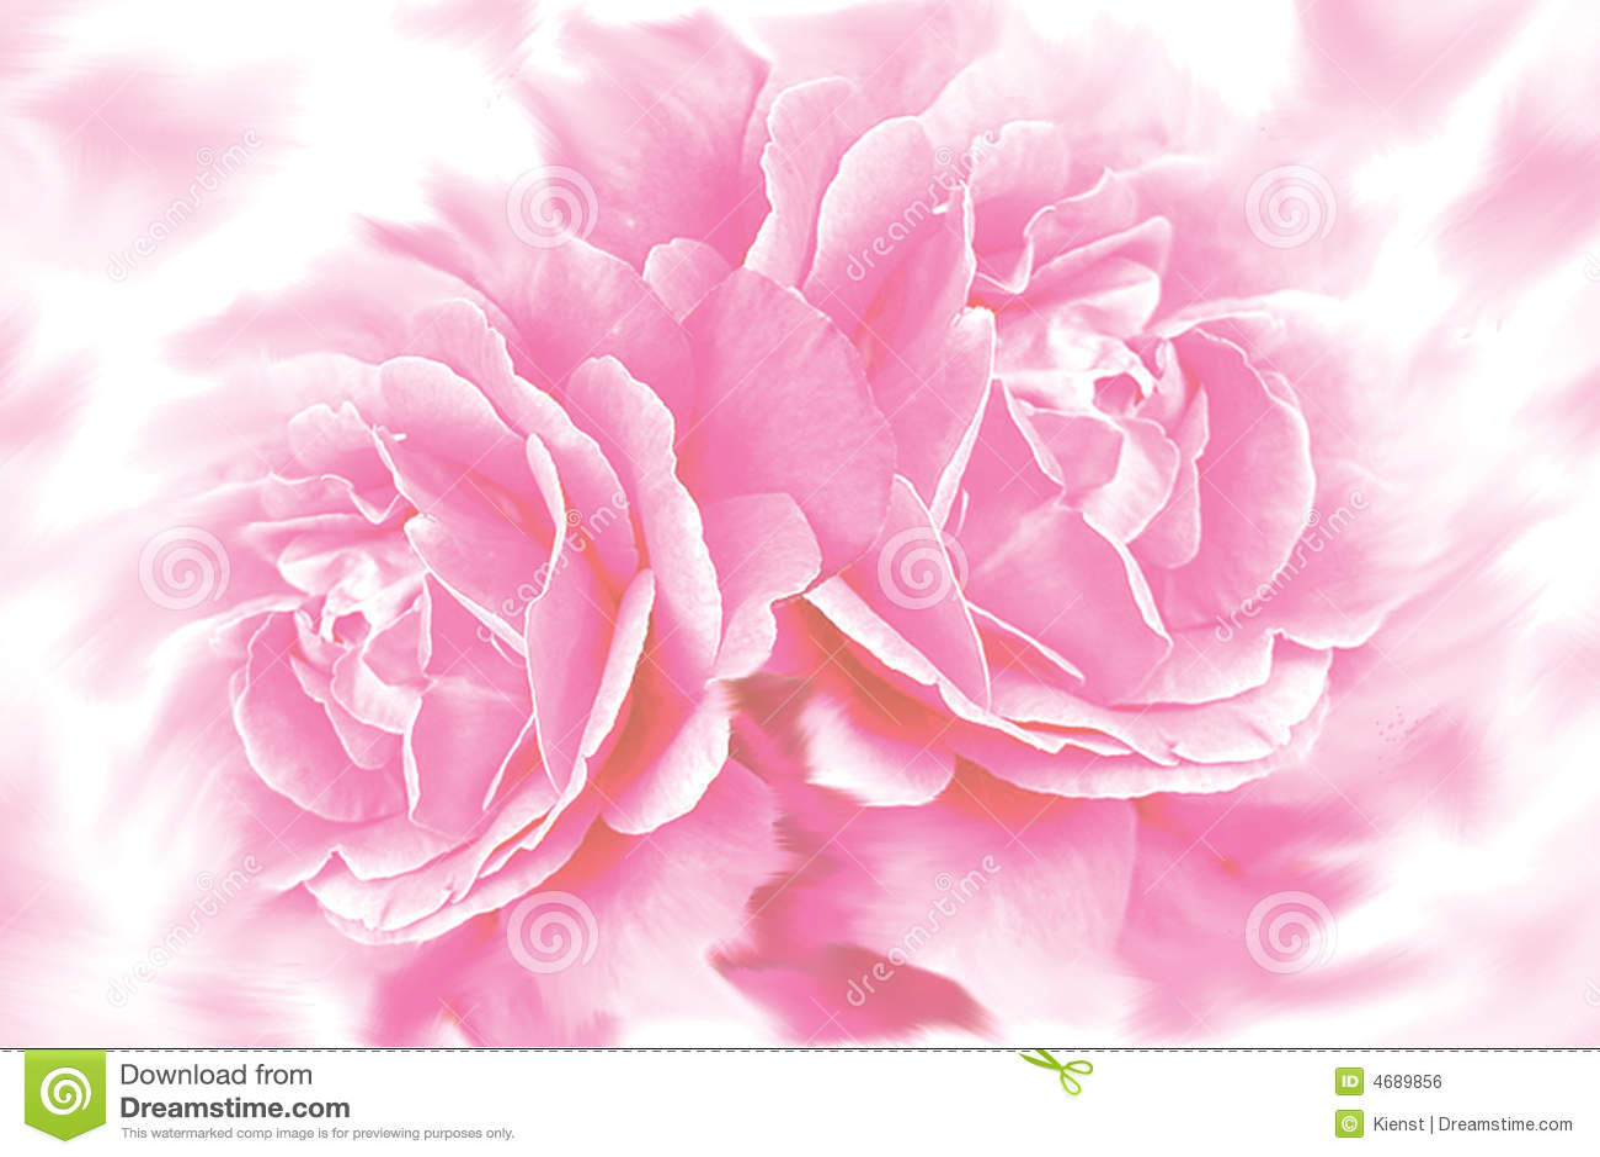 Cute Paw Print Wallpaper Rose Flower Background Stock Illustration Illustration Of